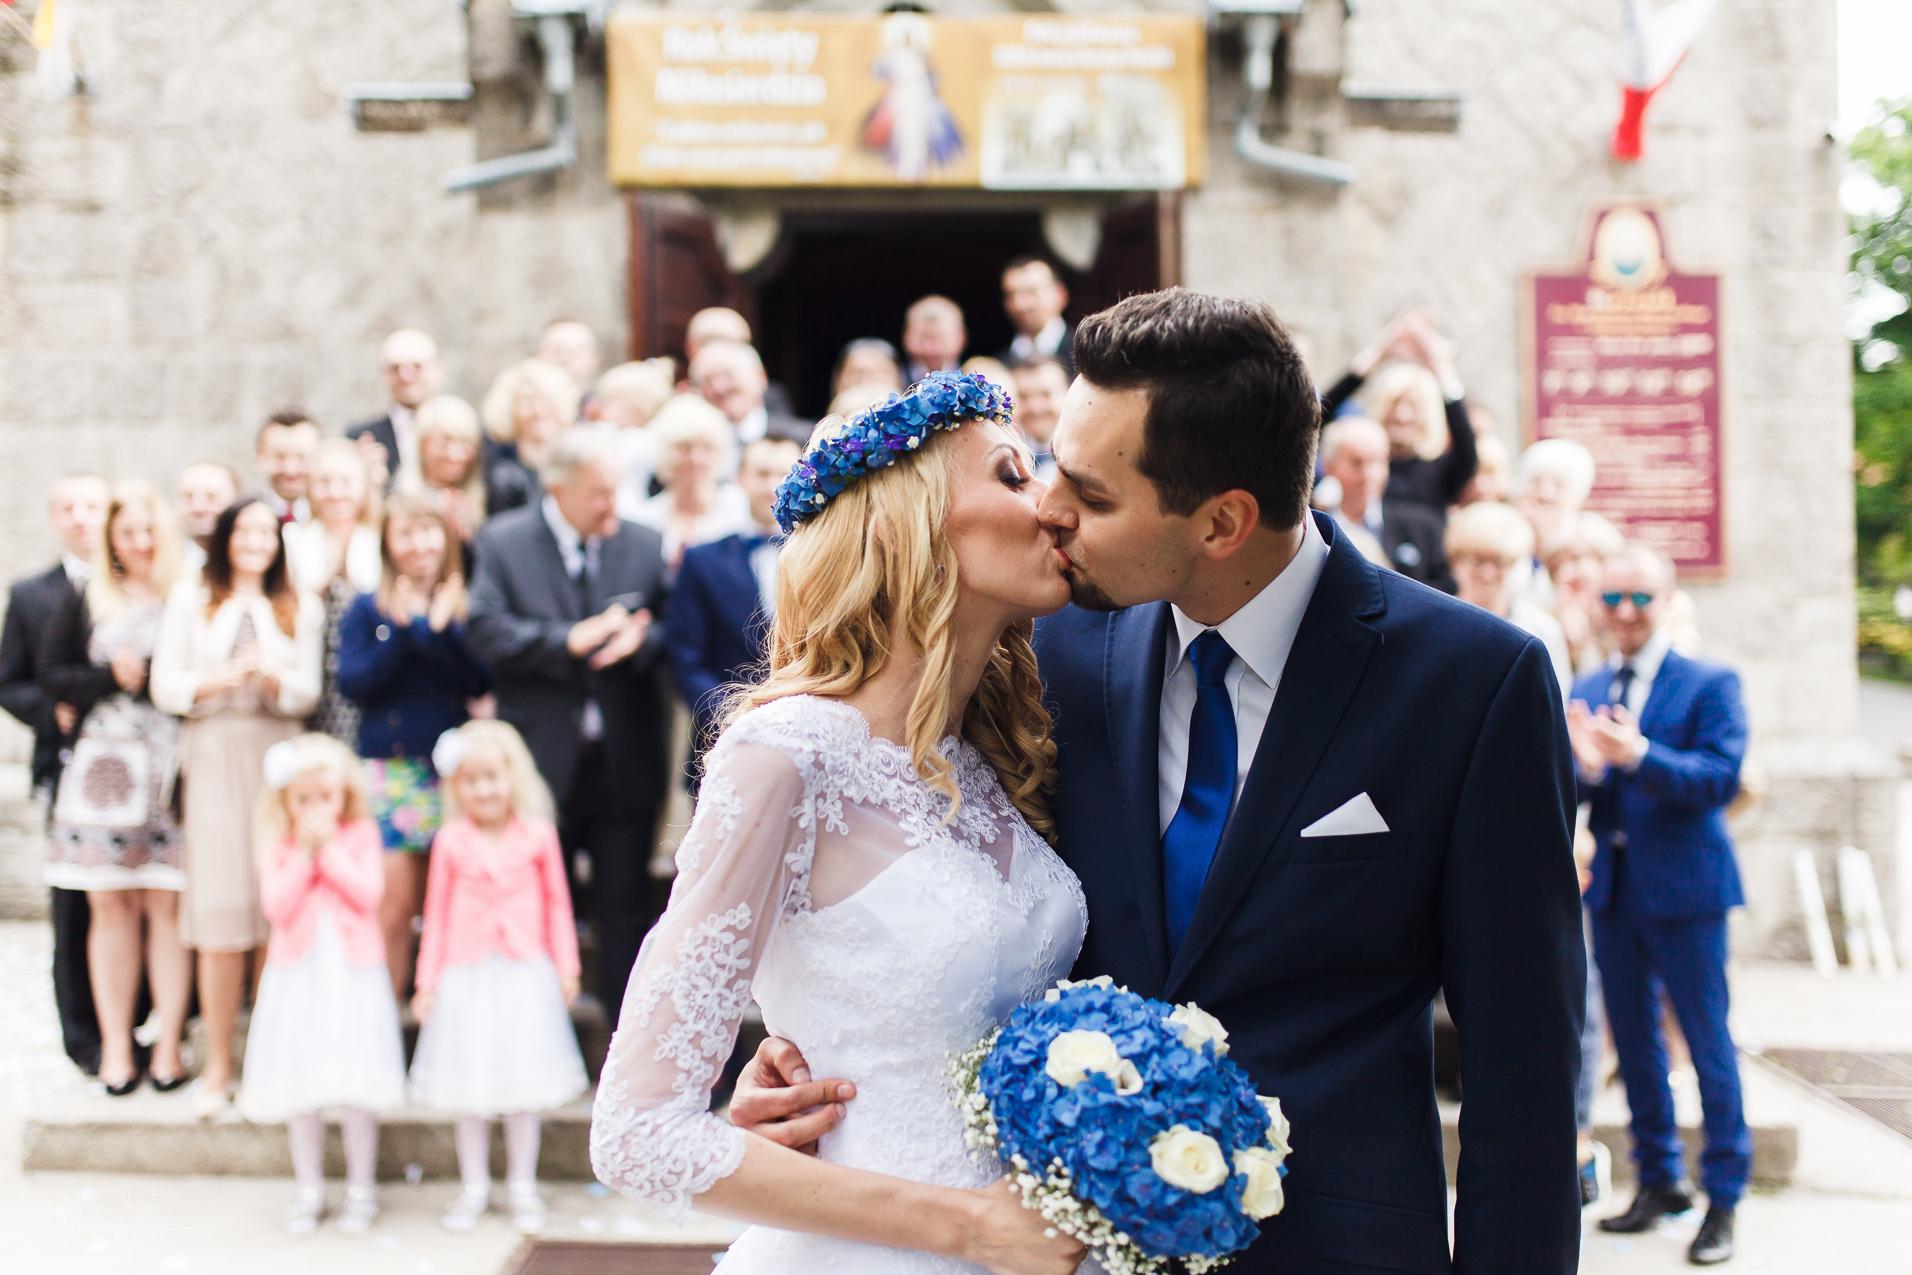 Ślub wesele szklarska poręba 30 Marta & Sławek